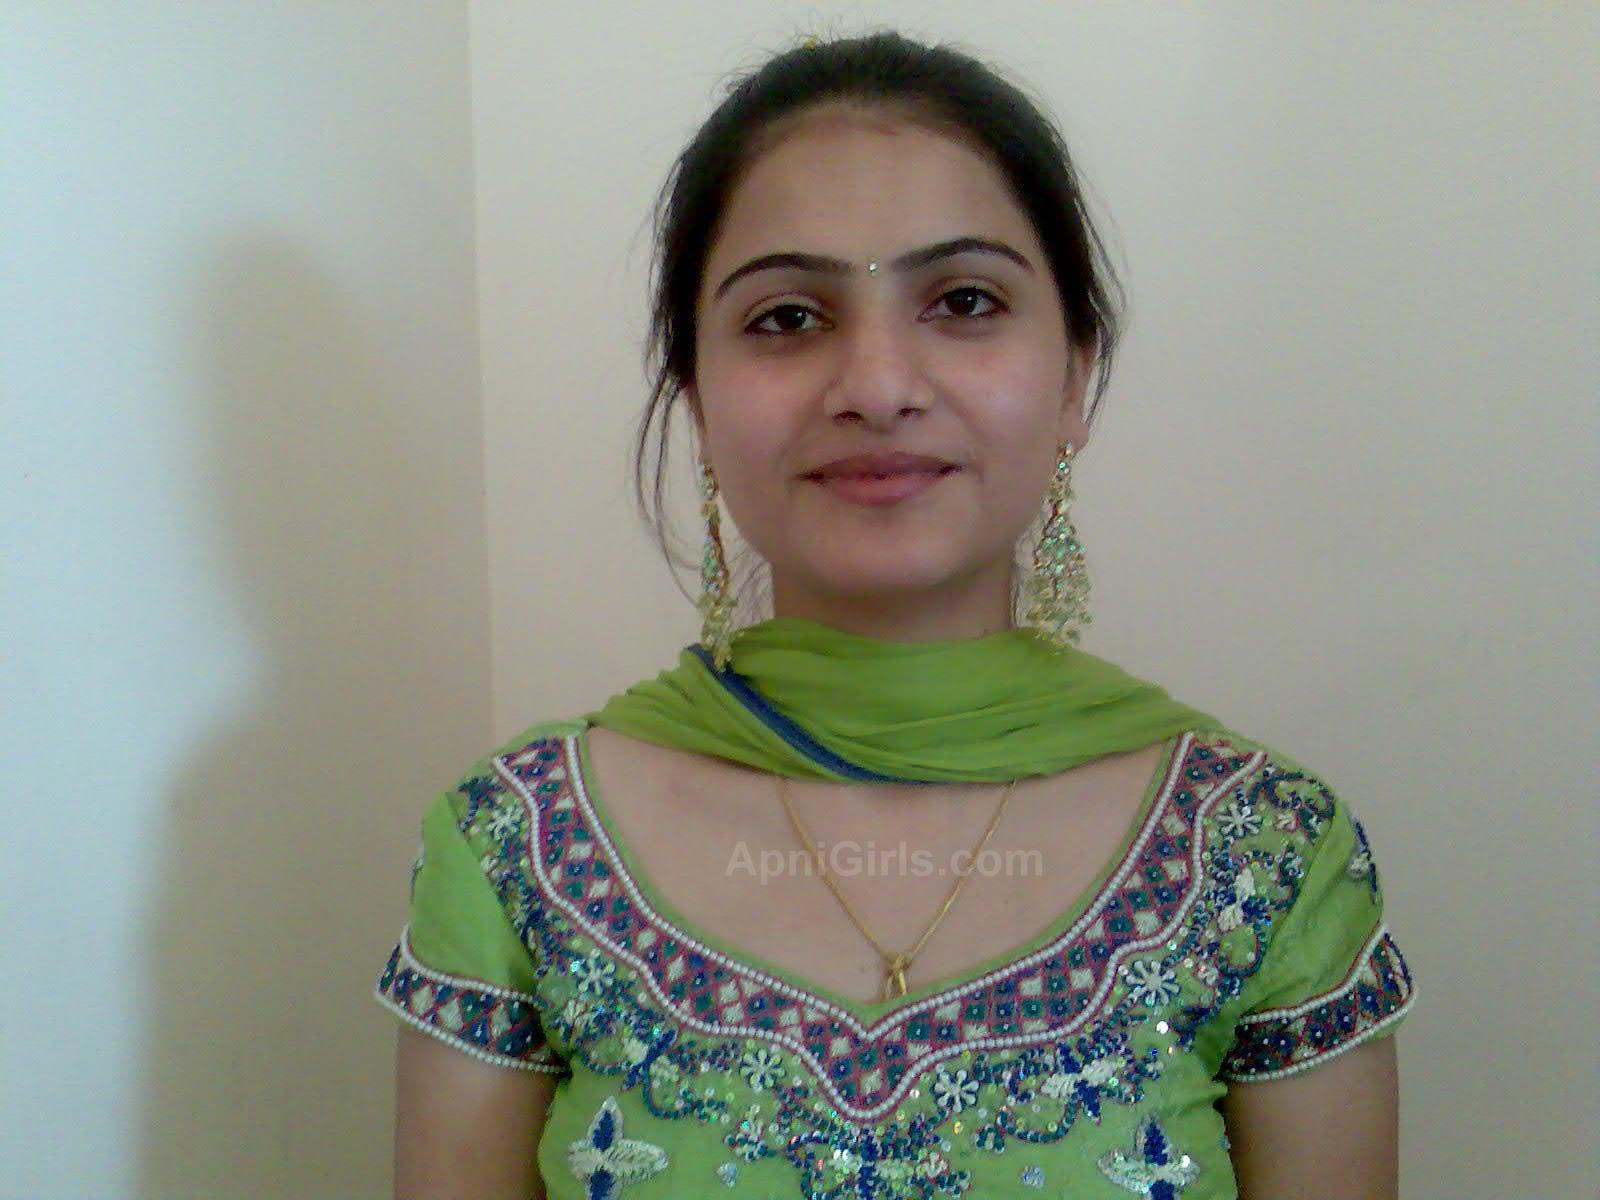 Cute And Beautiful Indian Girl